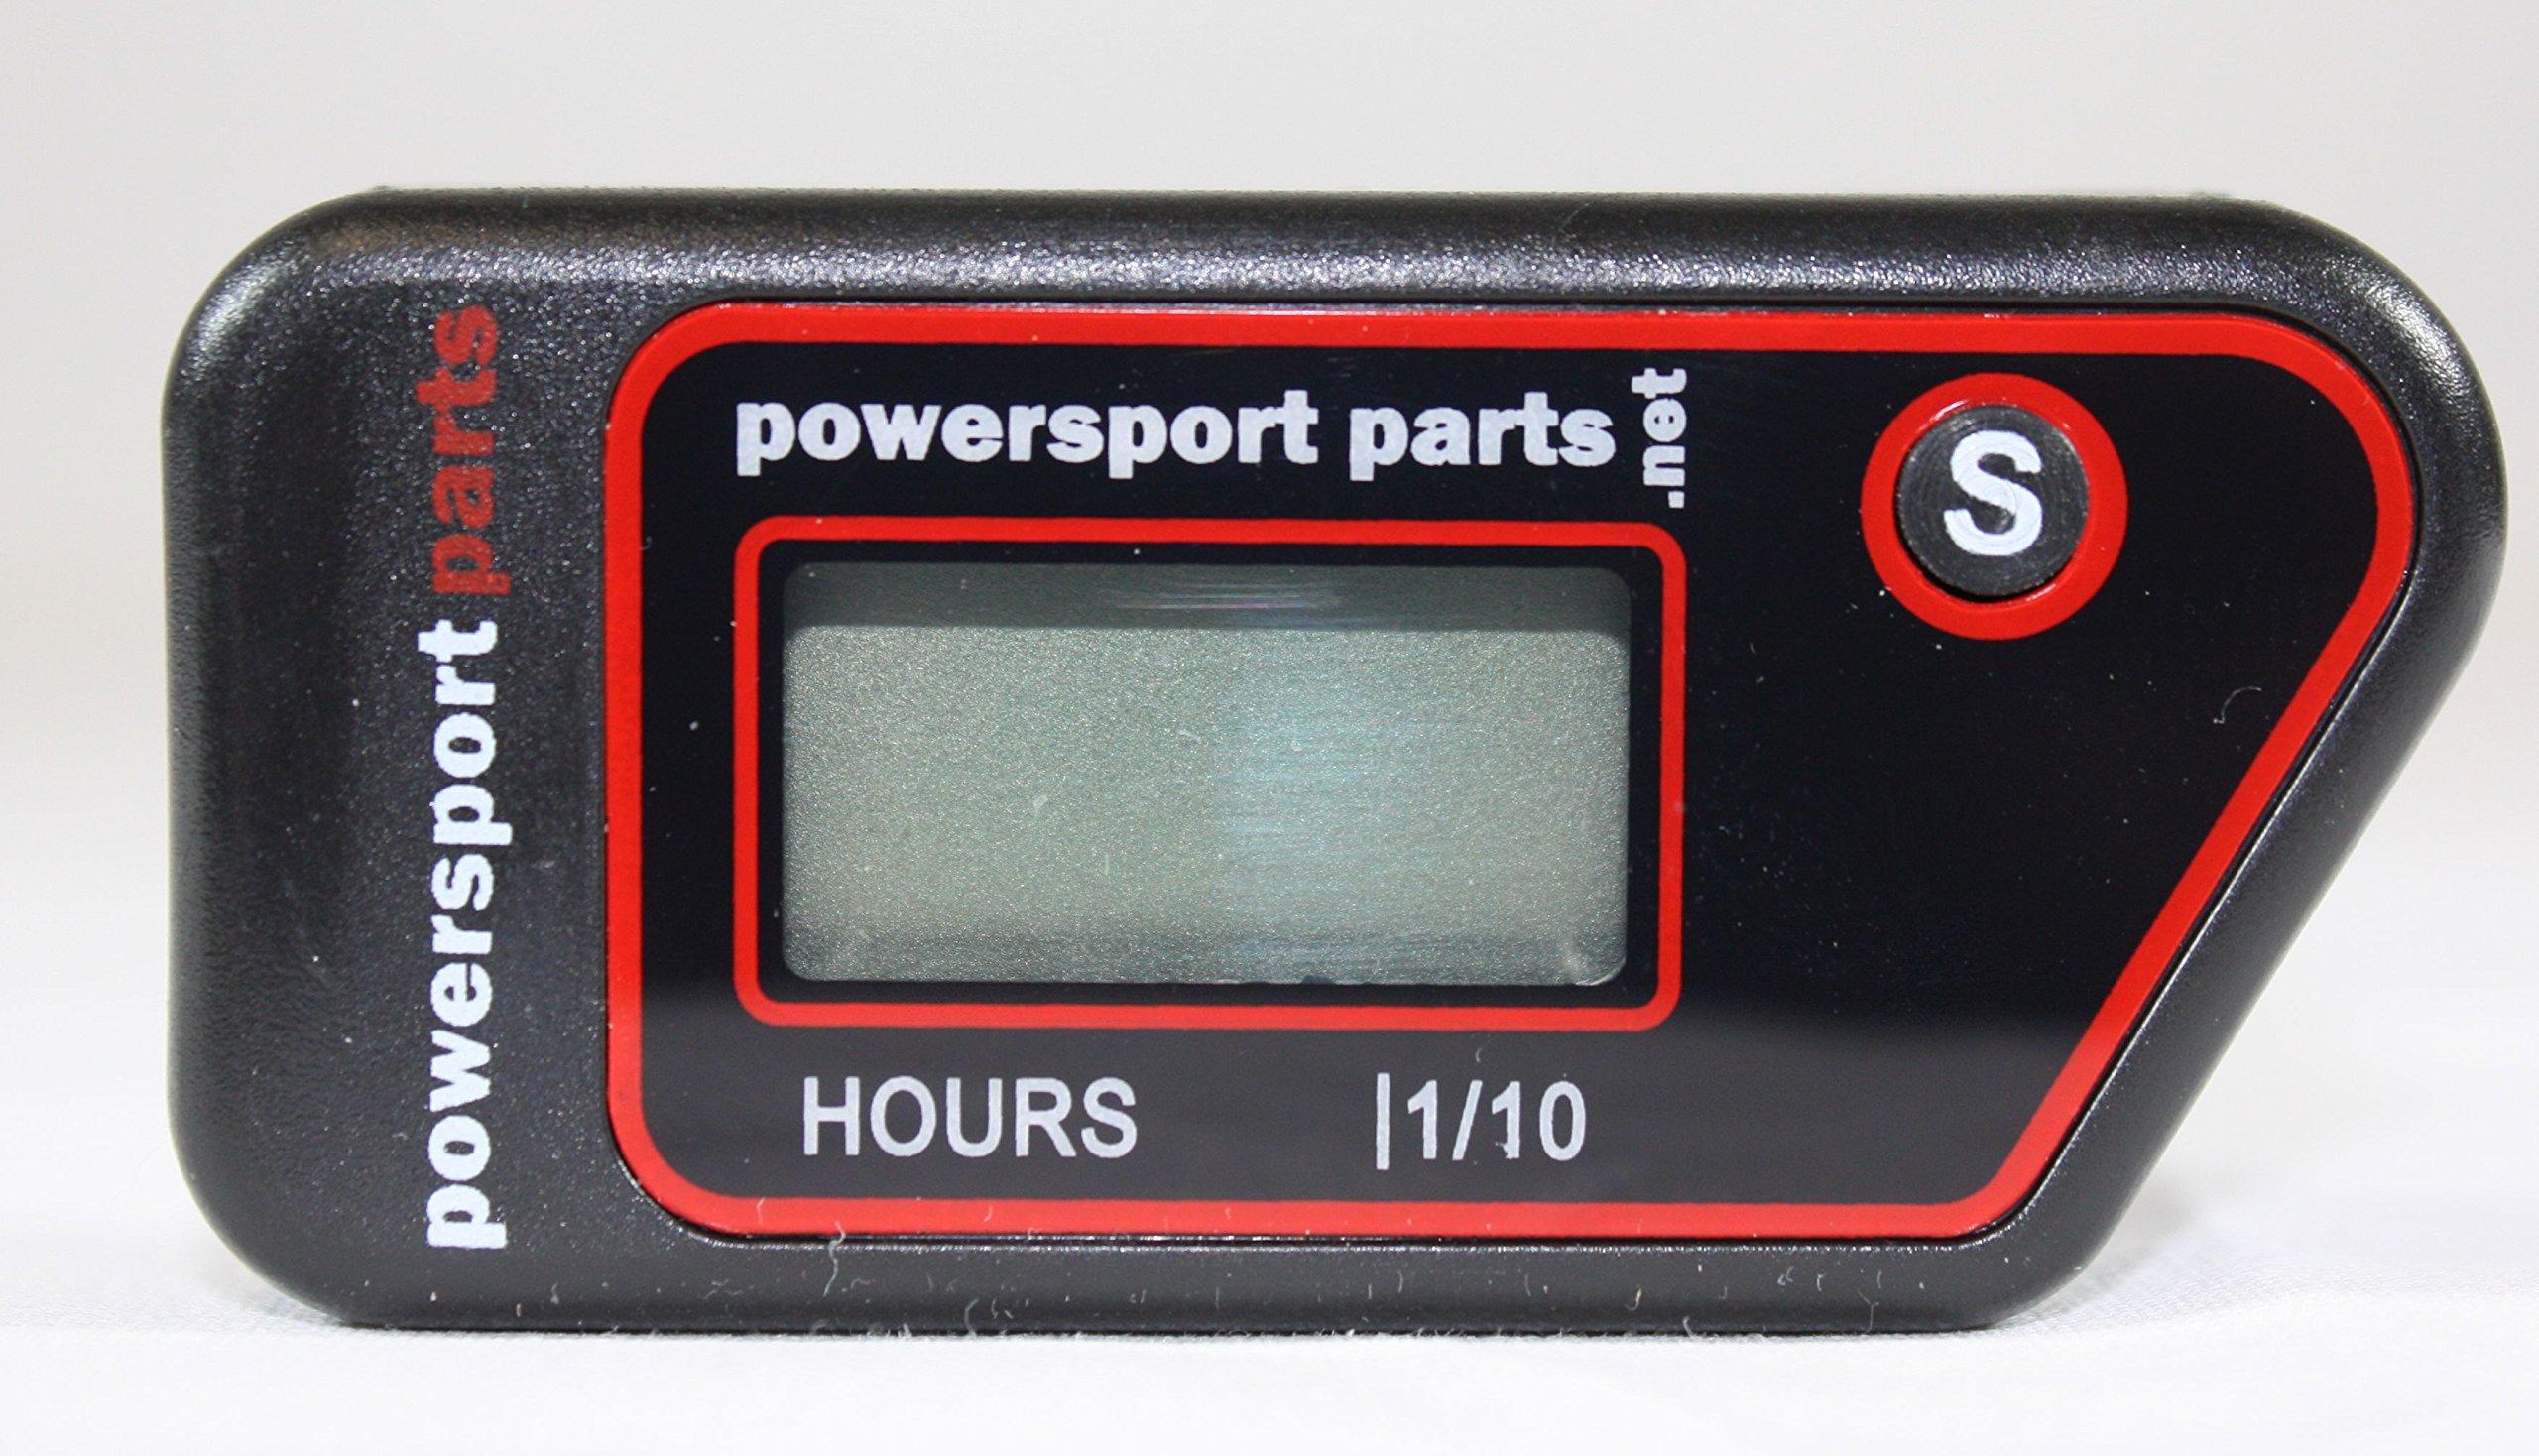 PSP Digital Waterproof Wireless Hour Meter for Motorcycle ATV Generator Small Engine by Powersport Parts